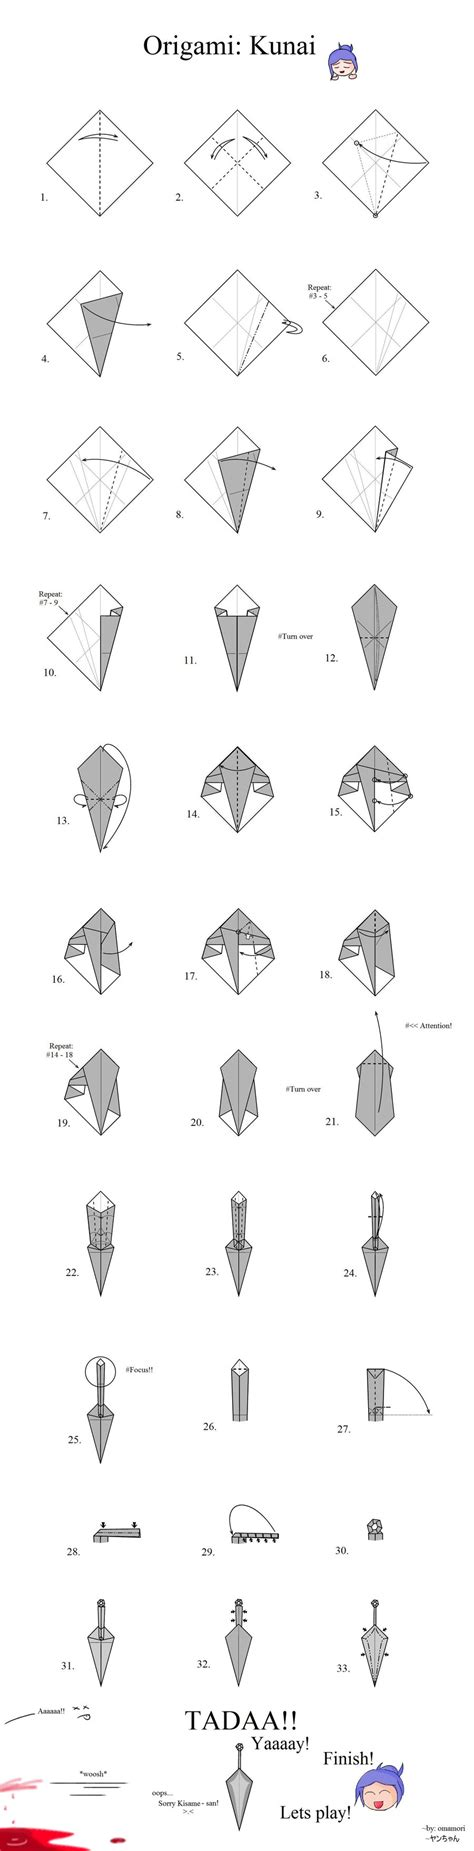 origami kunai knife tutorial origami kunai by mahou no omamori on deviantart